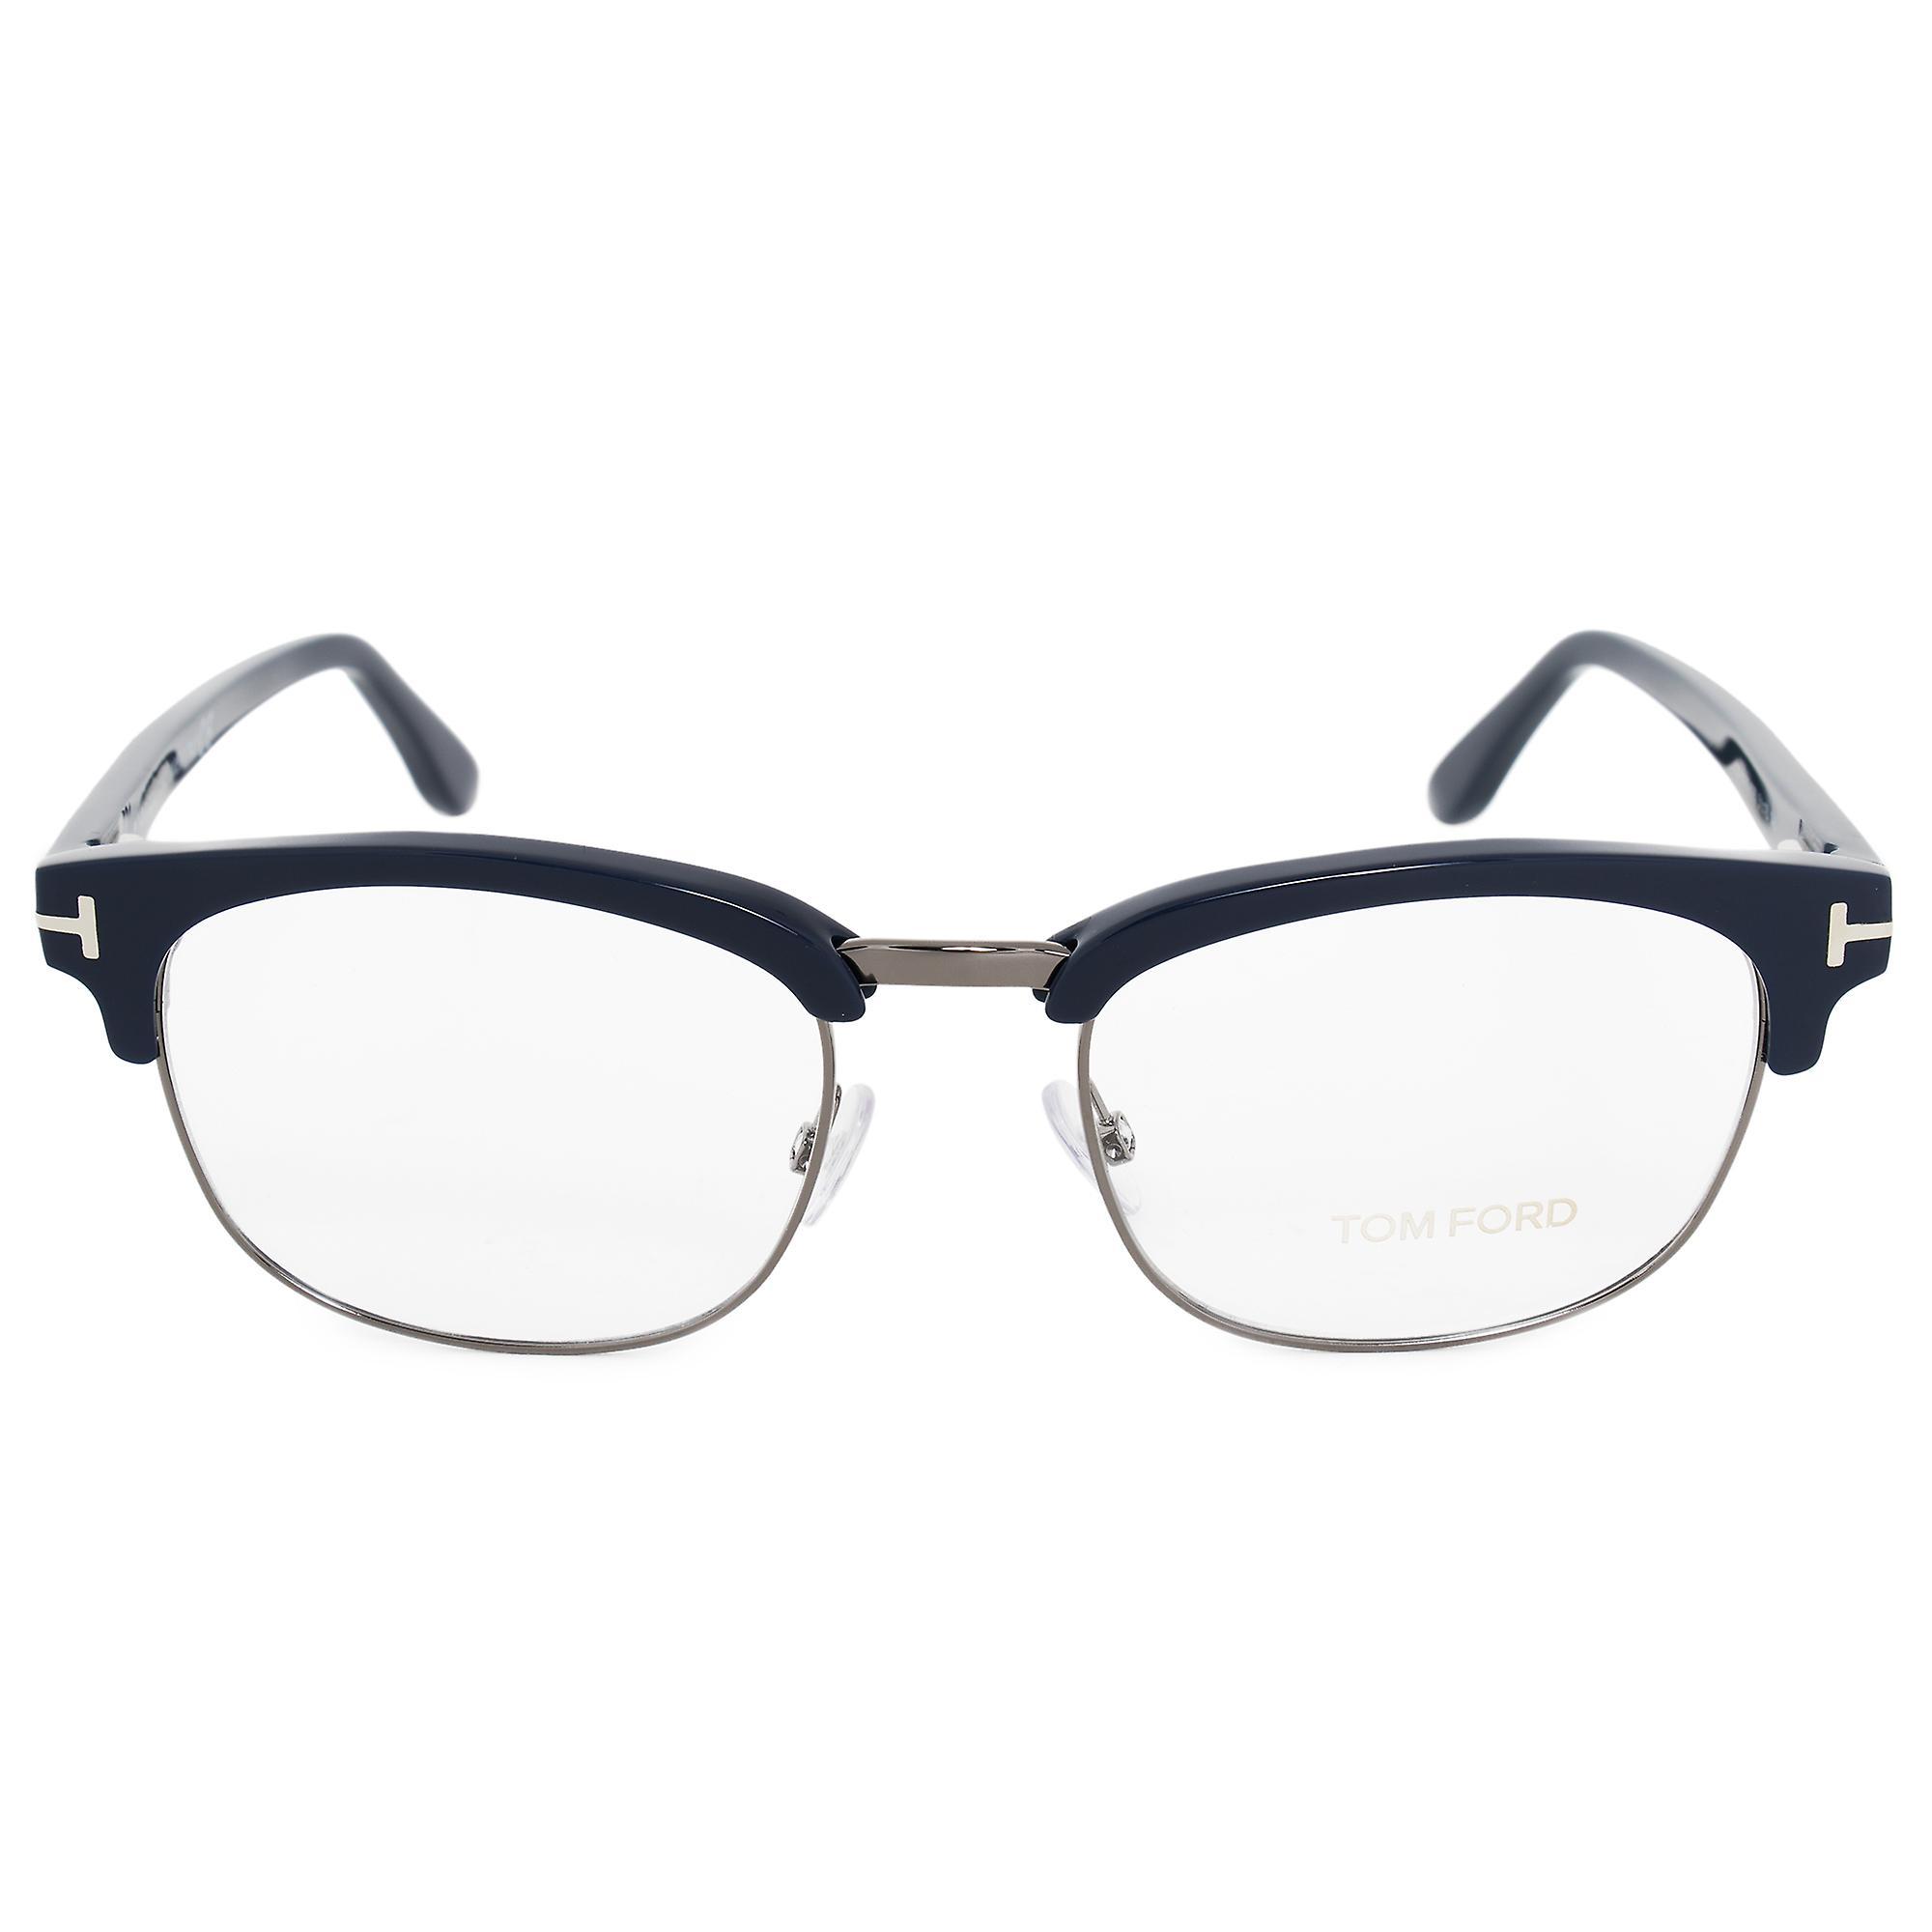 Tom Ford FT5458 090 51 Square | Blue | Eyeglass Frames